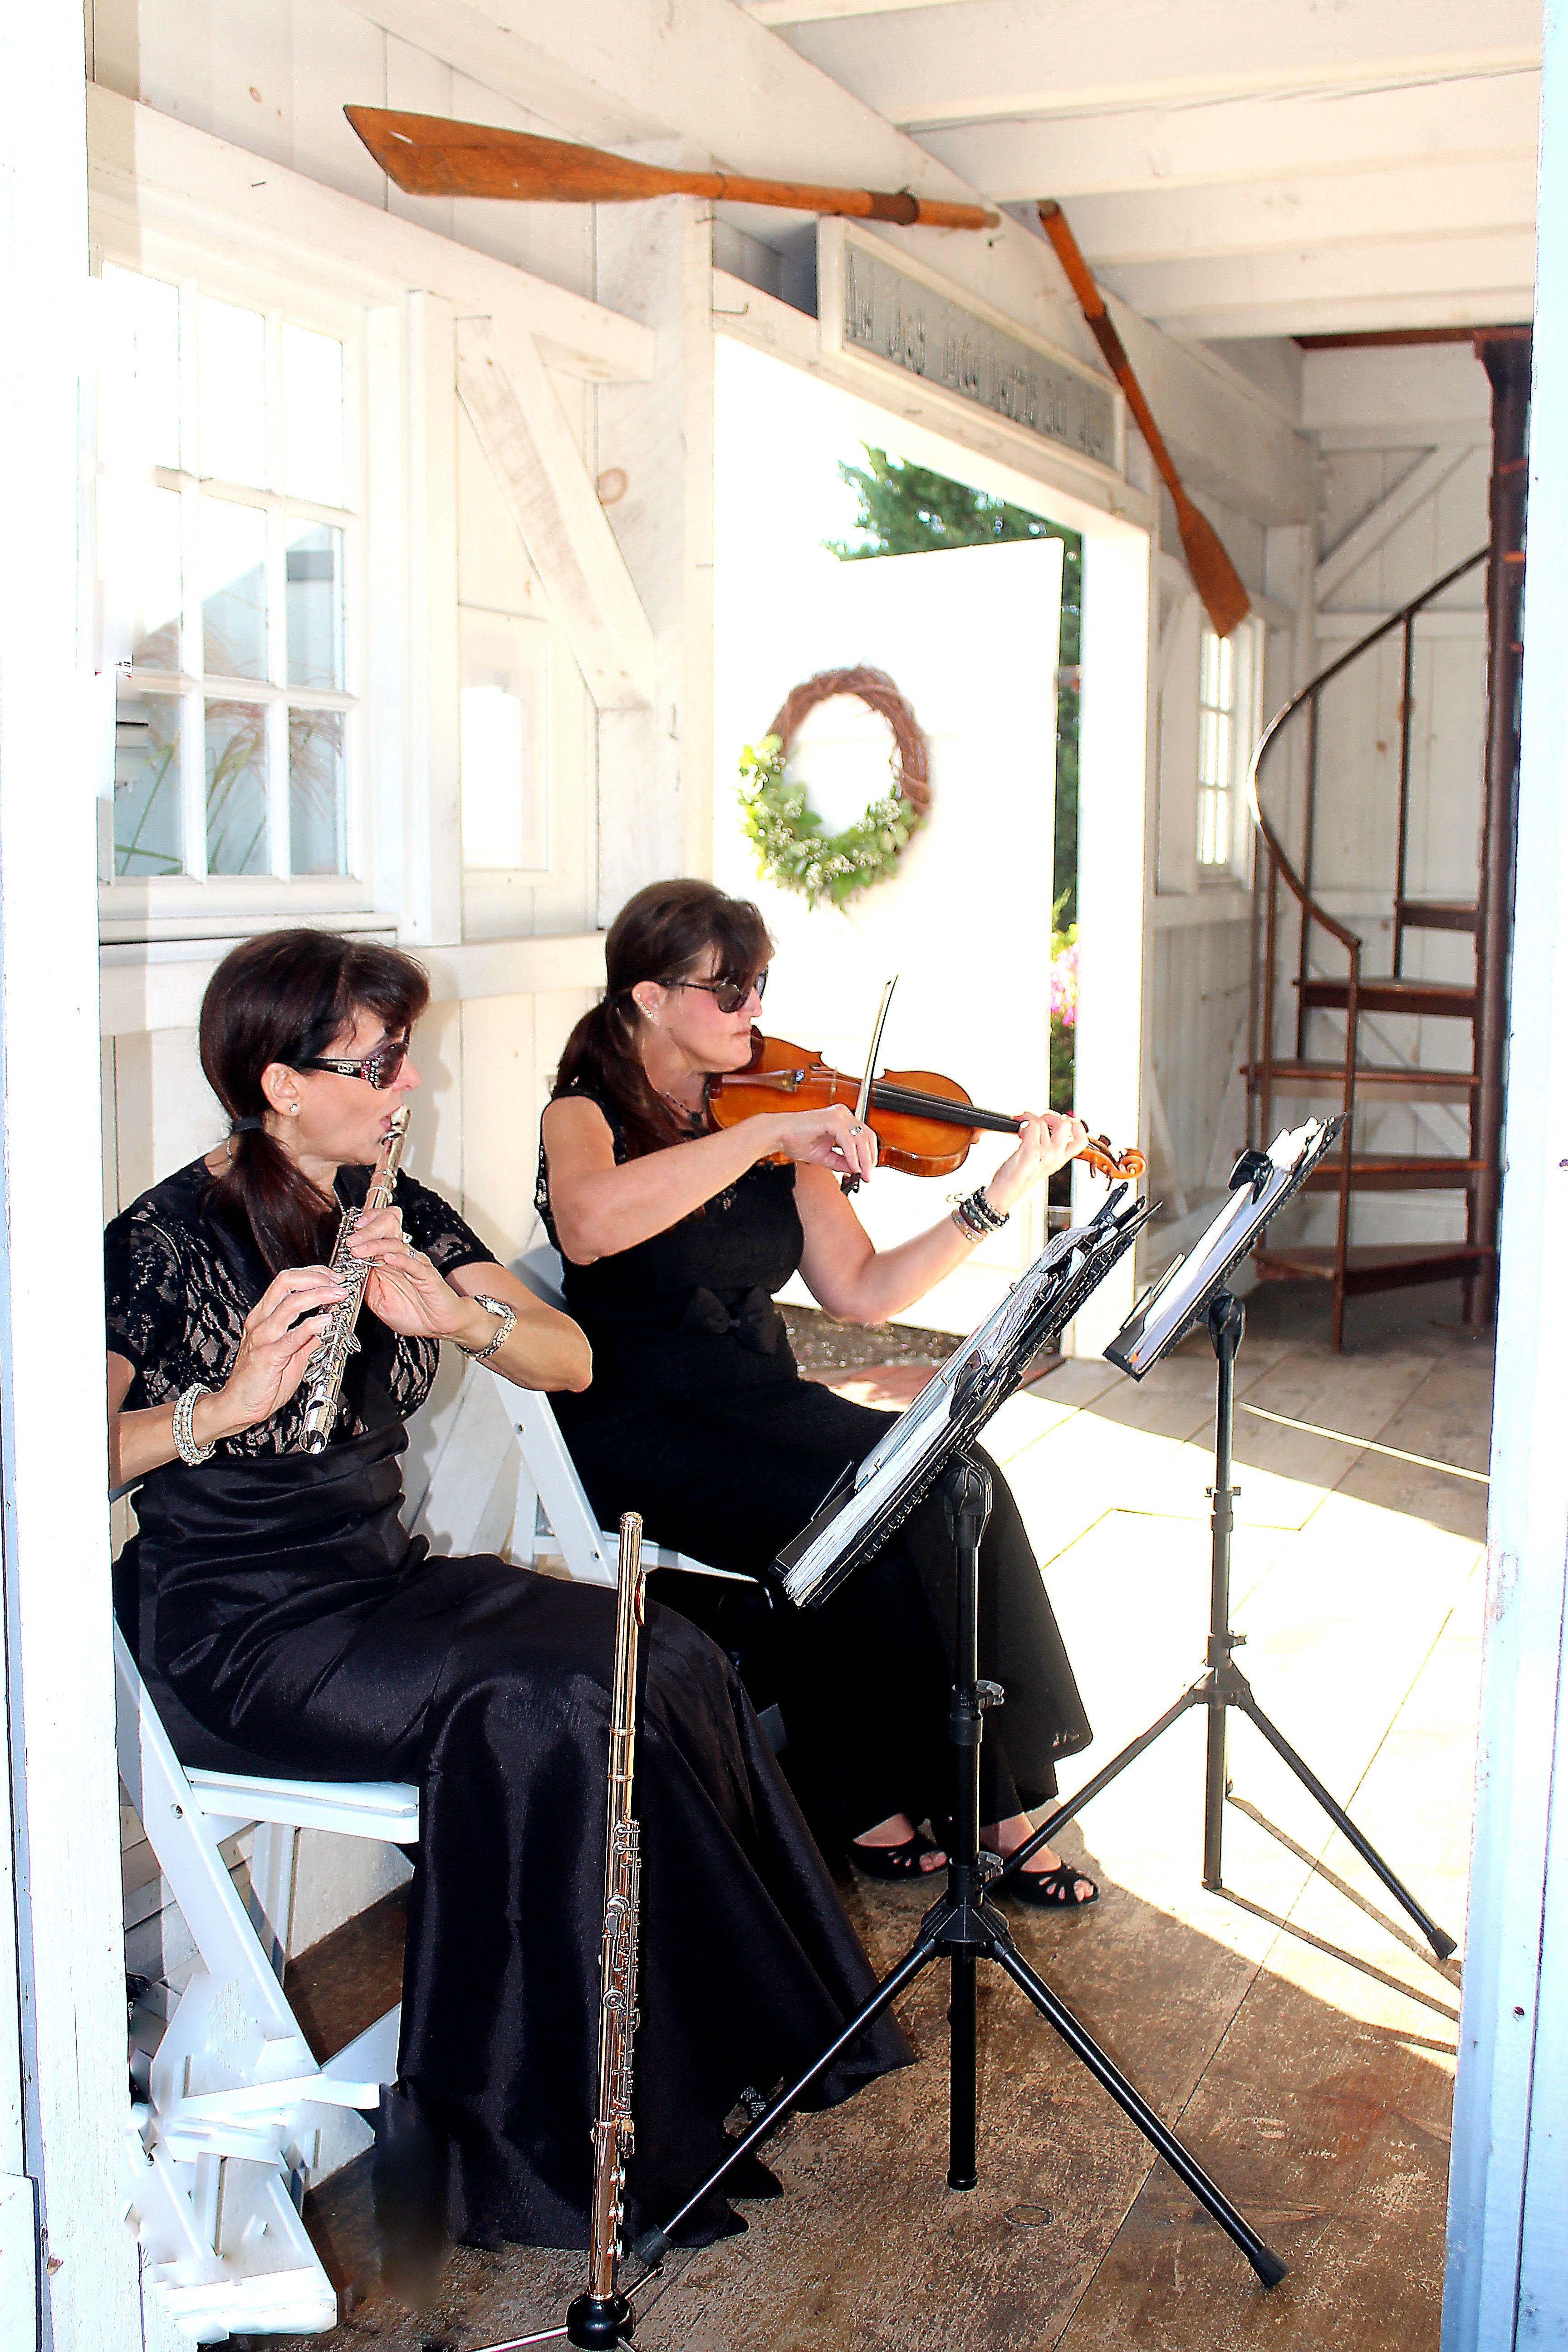 Bonnet Island, Manahawkin, NJ - Ceremony Music by Bridal Music ...